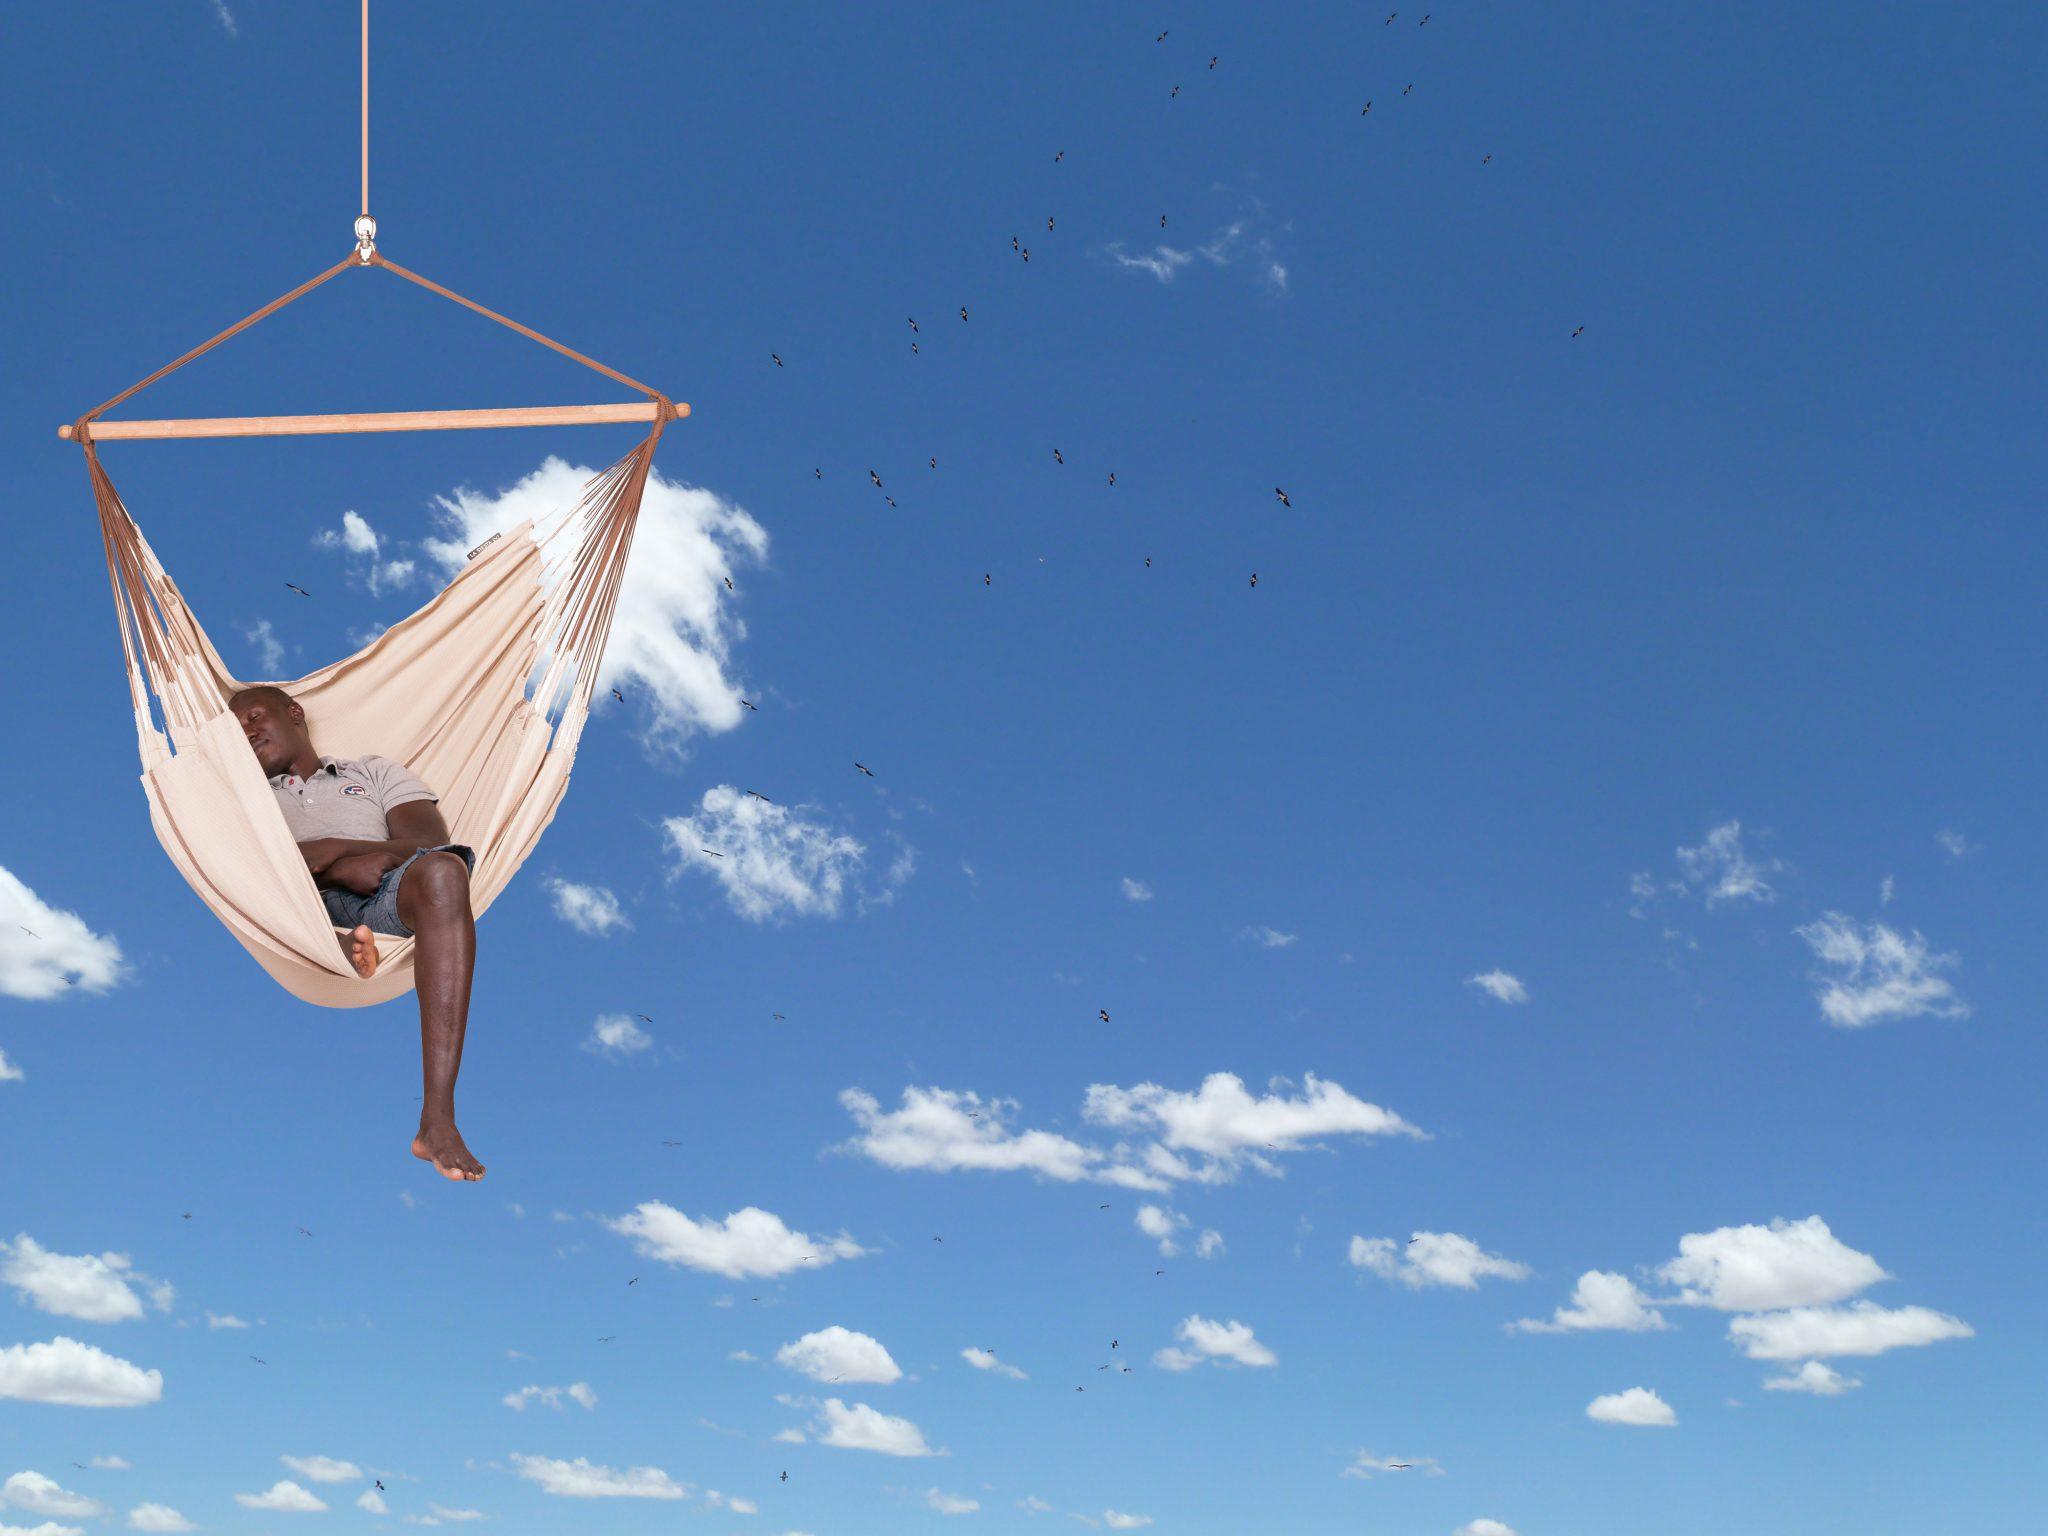 7 Best Spots To Hang A Hammock Chair Outdoors